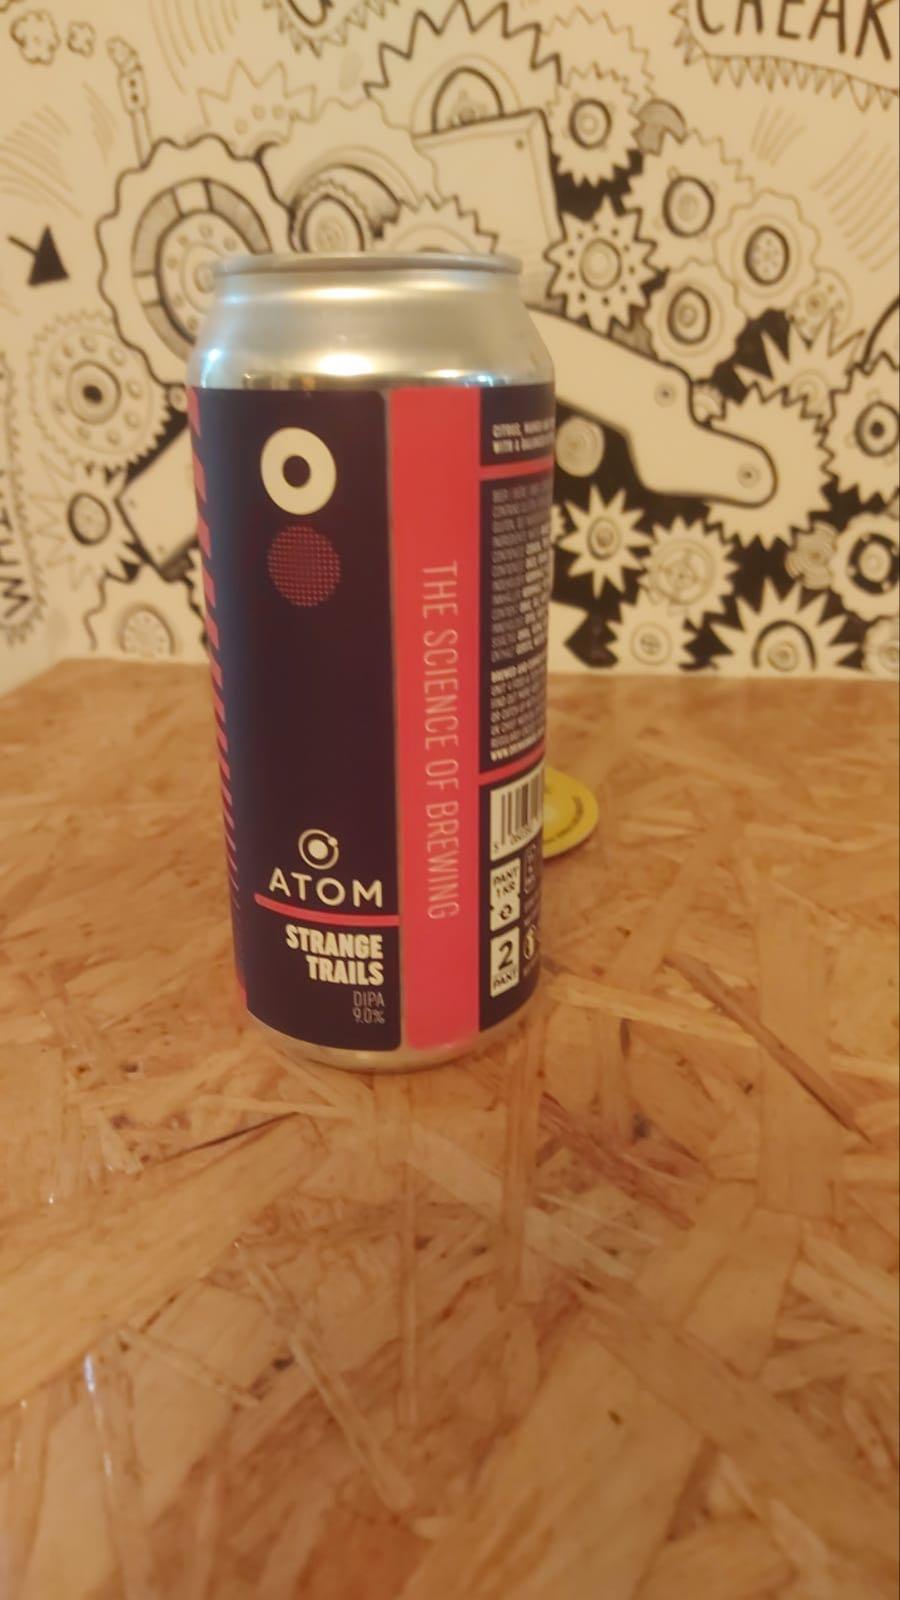 Atom Brewery Strange Trails DIPA 9%